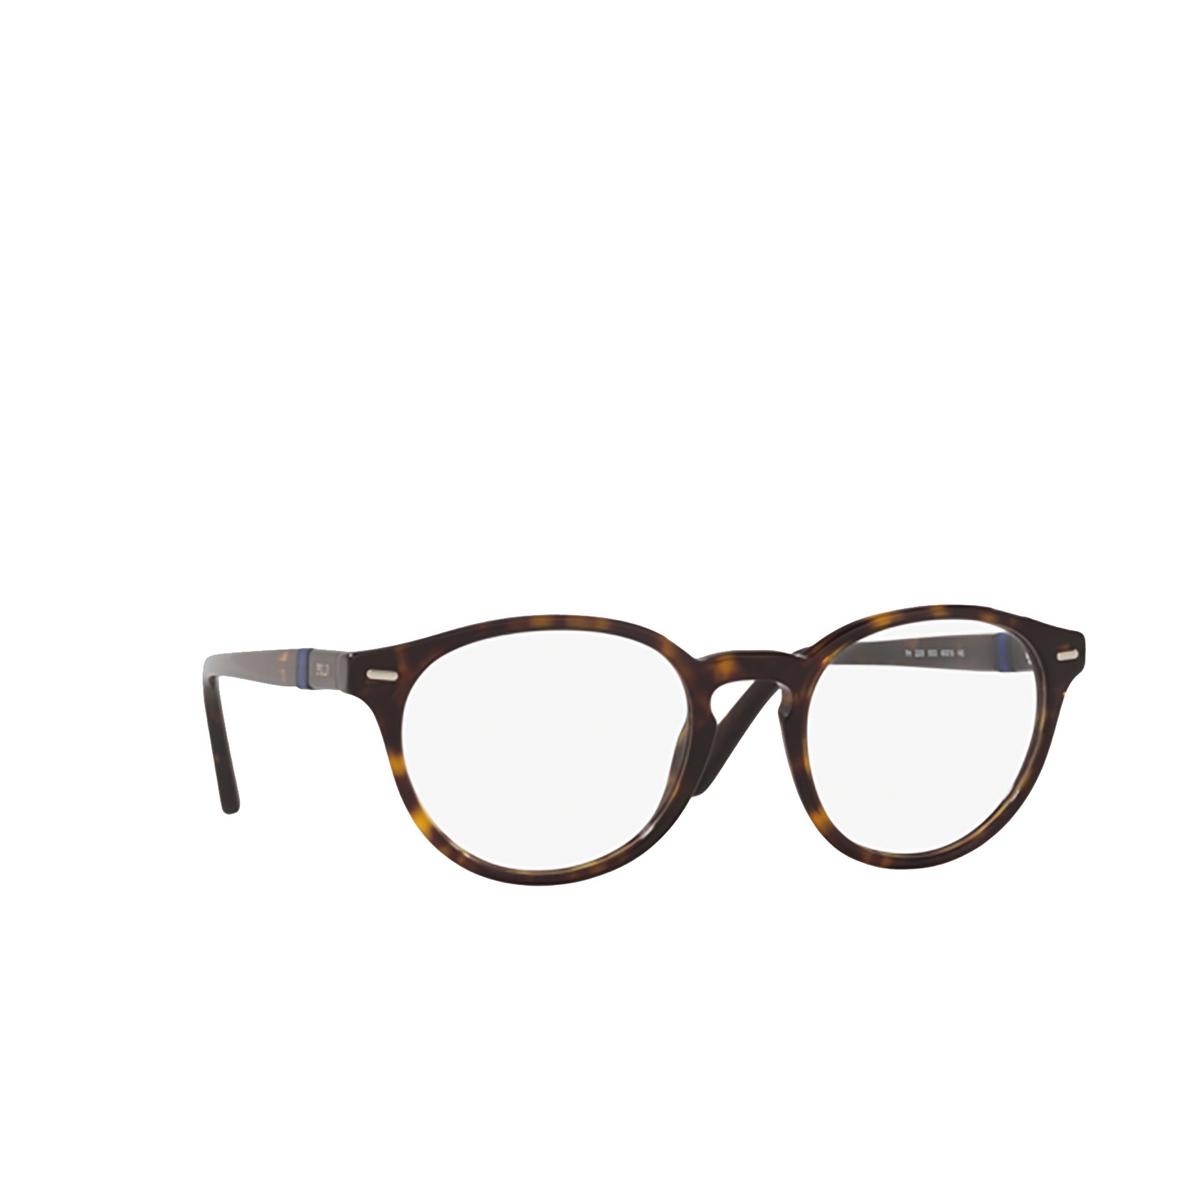 Polo Ralph Lauren® Round Eyeglasses: PH2208 color Shiny Dark Havana 5003 - three-quarters view.